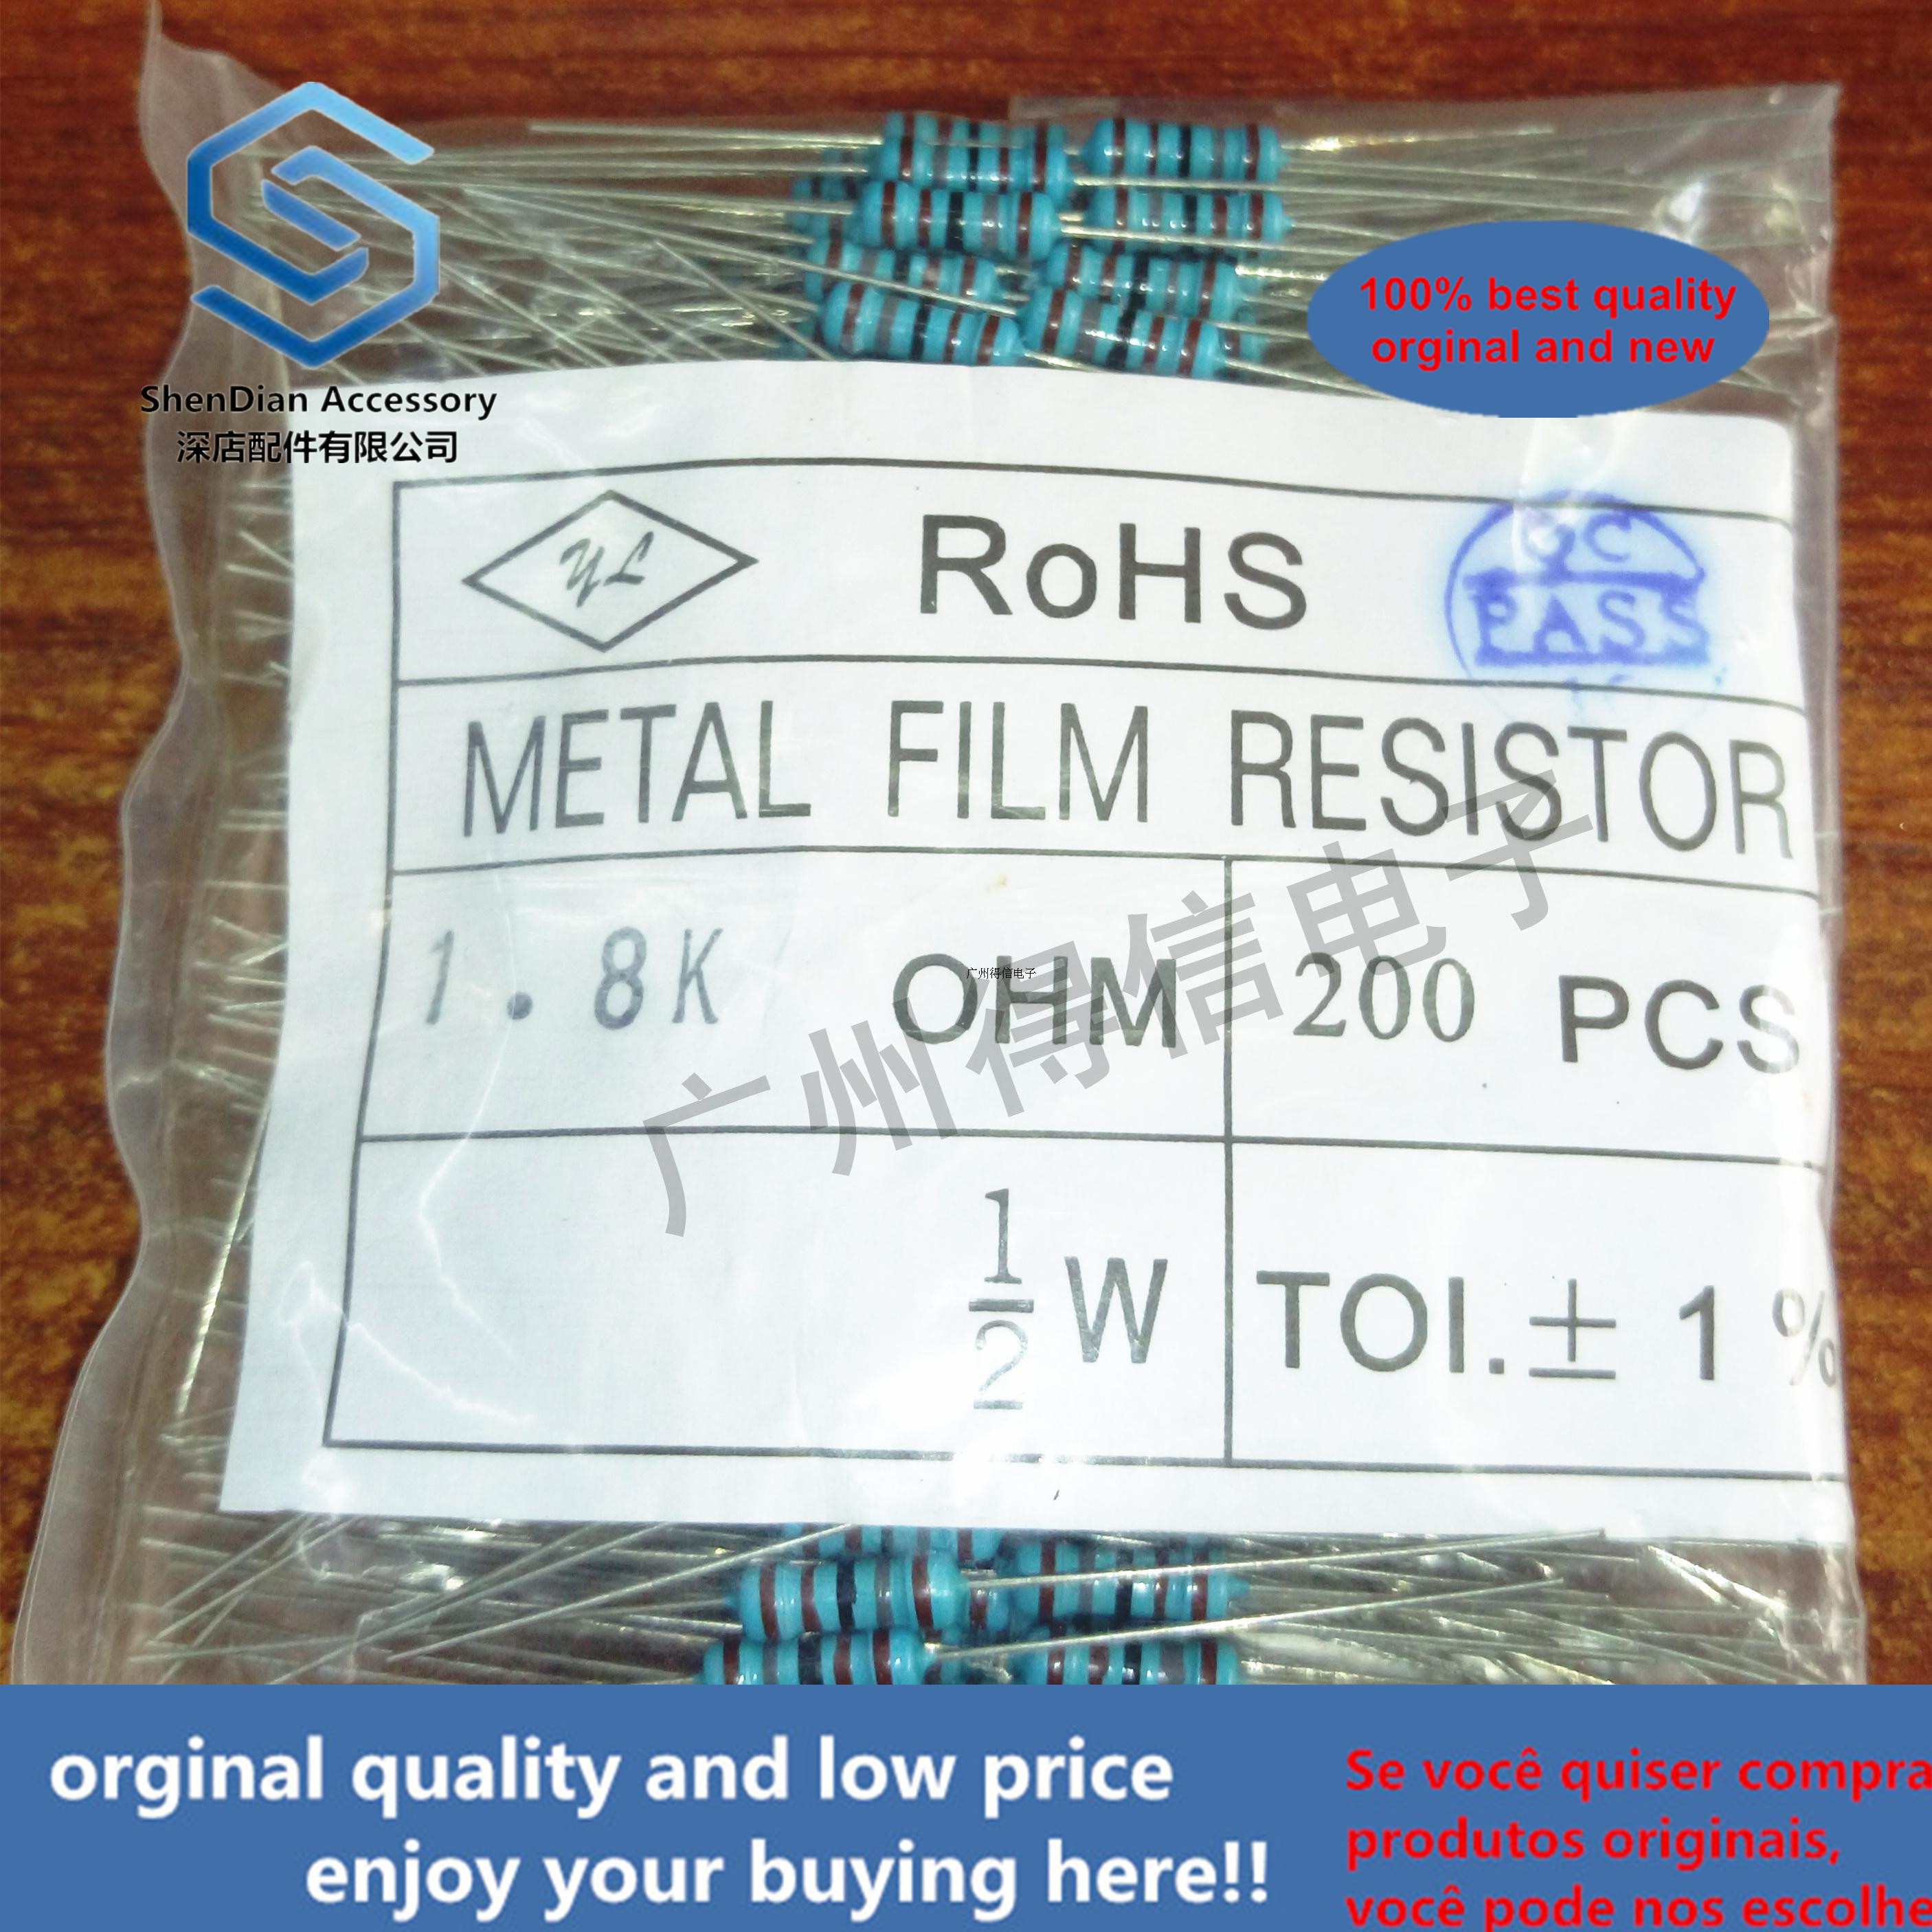 200pcs 1 / 2W 2K 2000 Euro 1% Brand New Metal Film Iron Feet Resistance Bag Pack Of 200